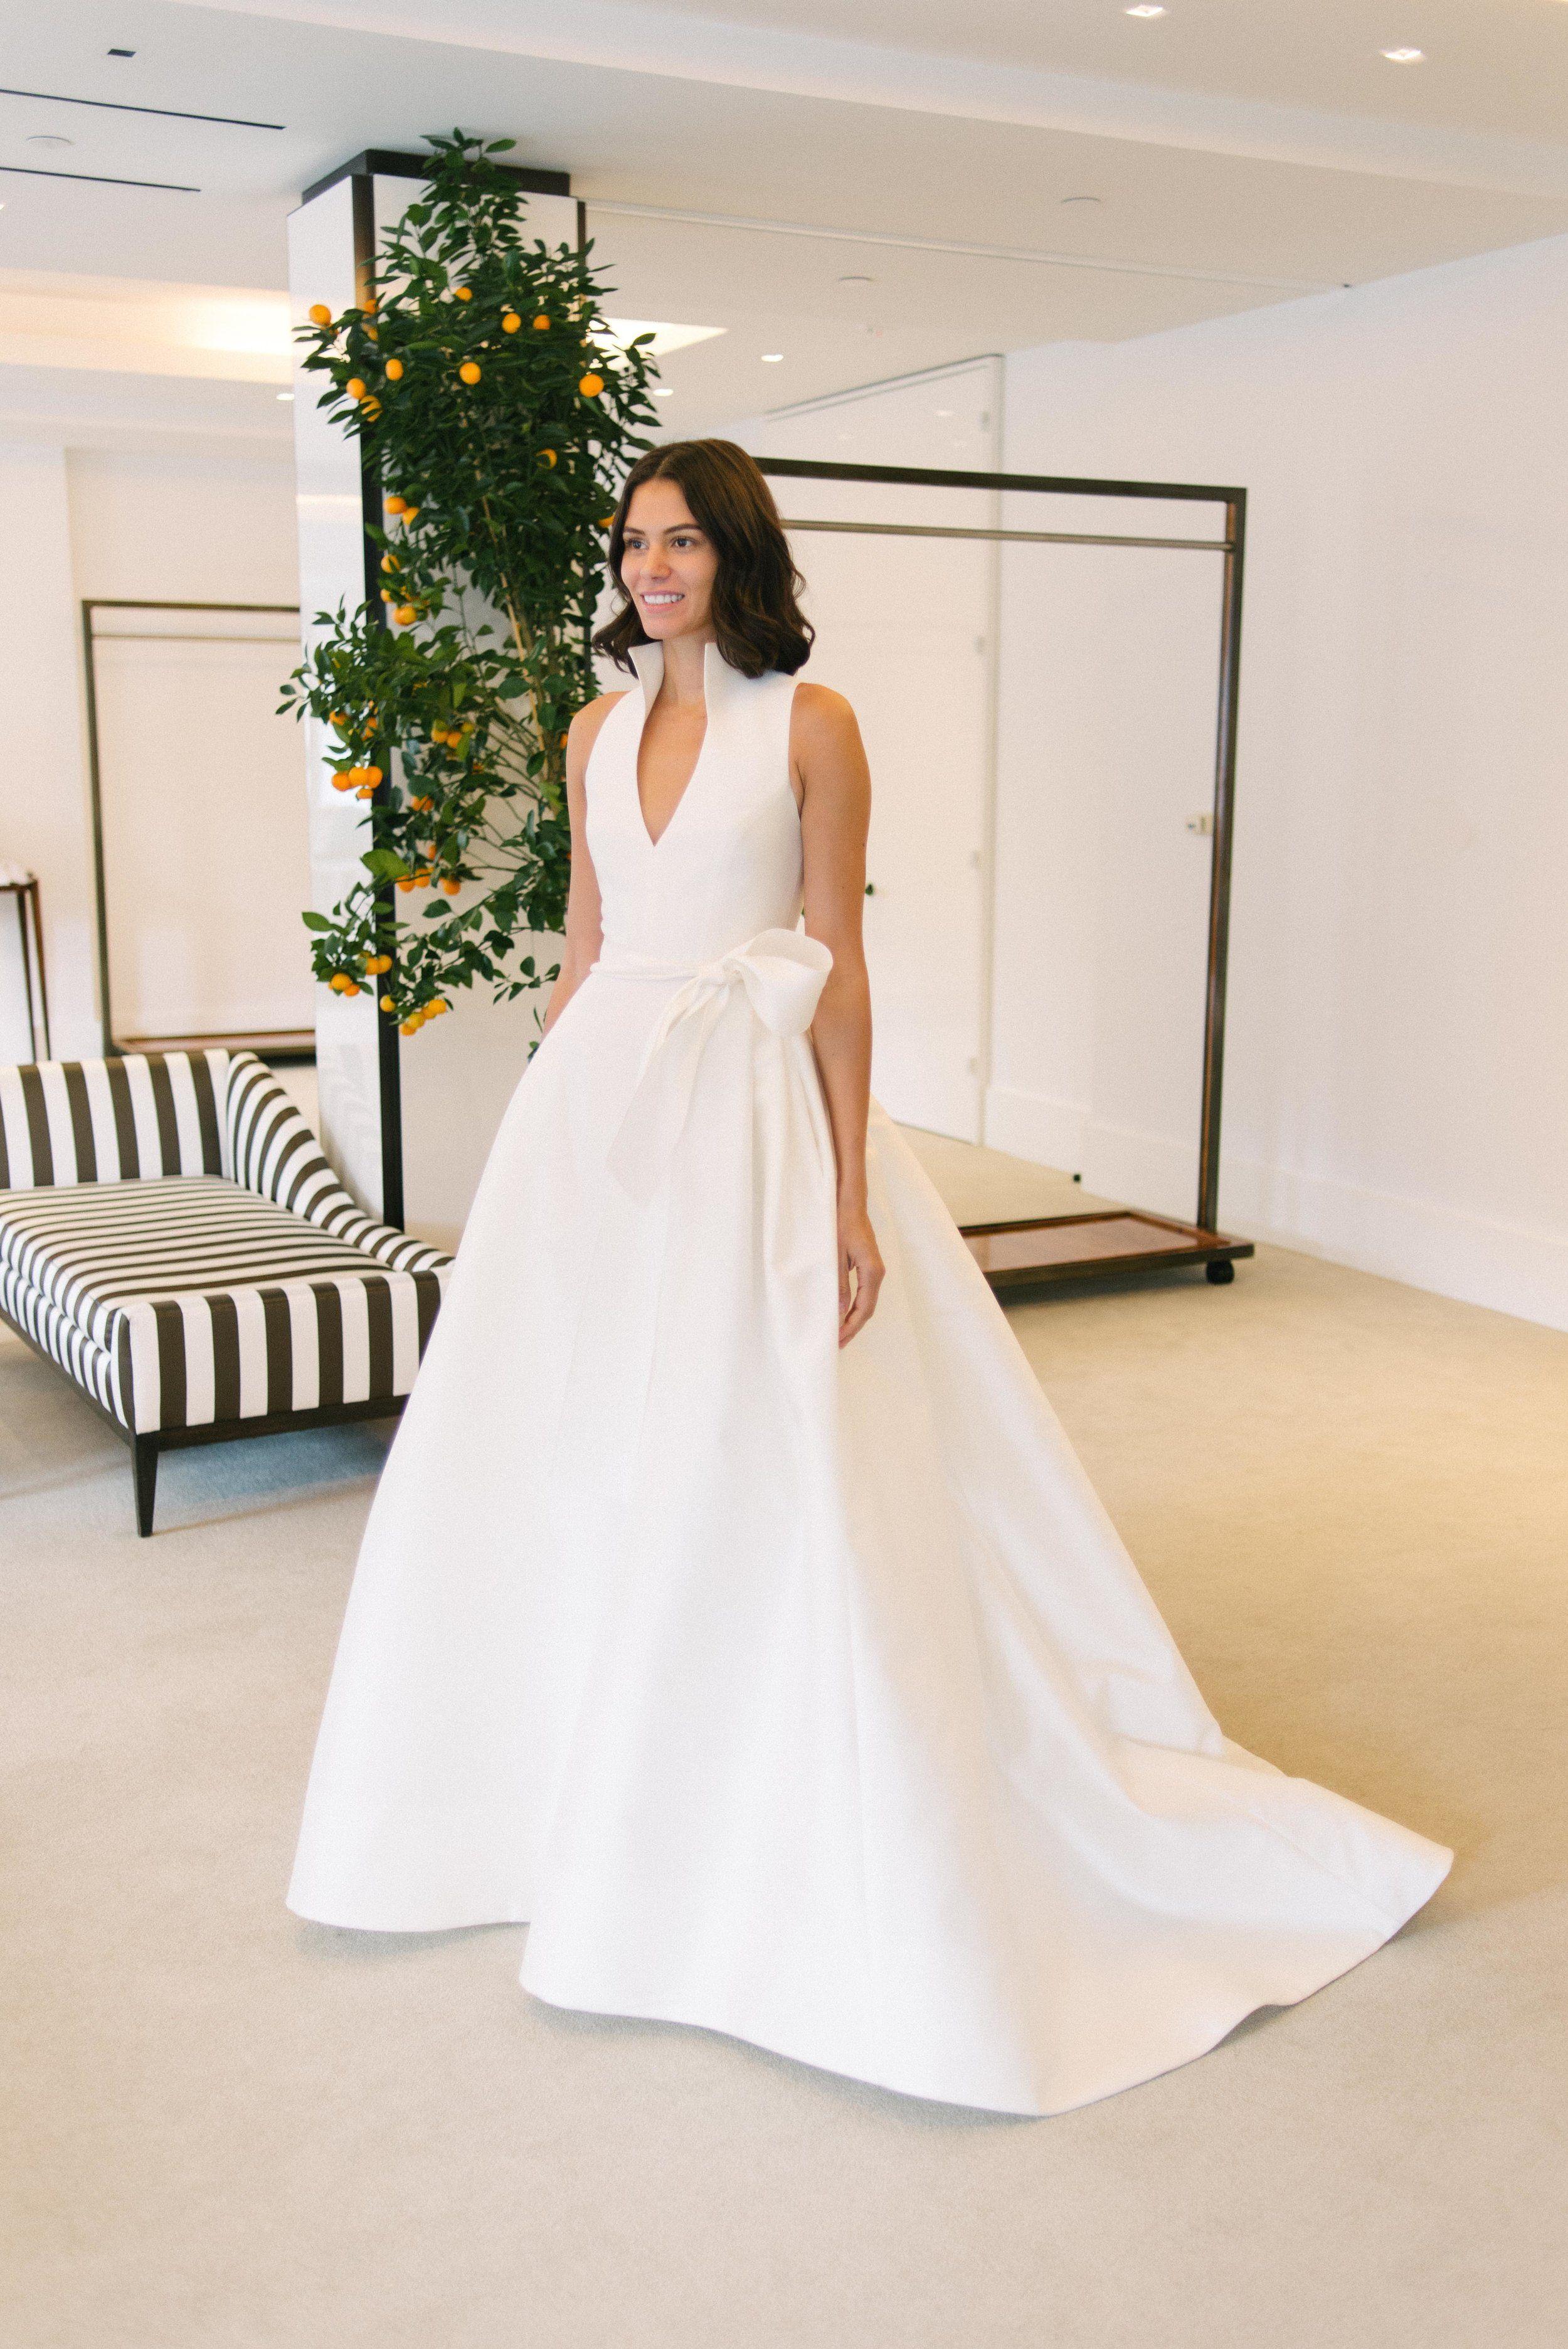 Carolina Herrera Spring 2020 Collection Preview Lydia Little White Dress Bridal Shop White Bridal Dresses Beautiful Bridal Dresses Designer Wedding Dresses